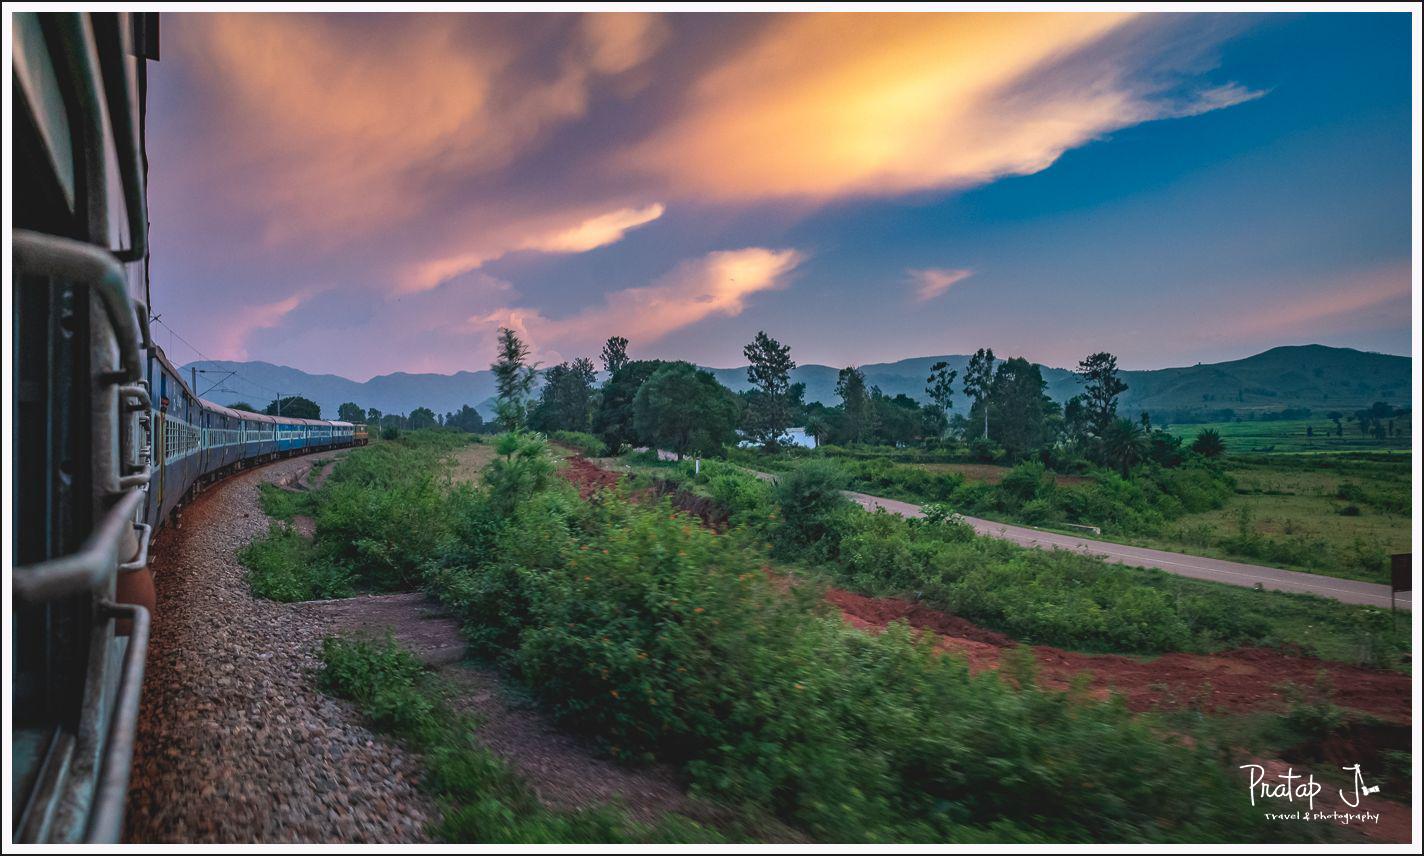 Araku Valley by train